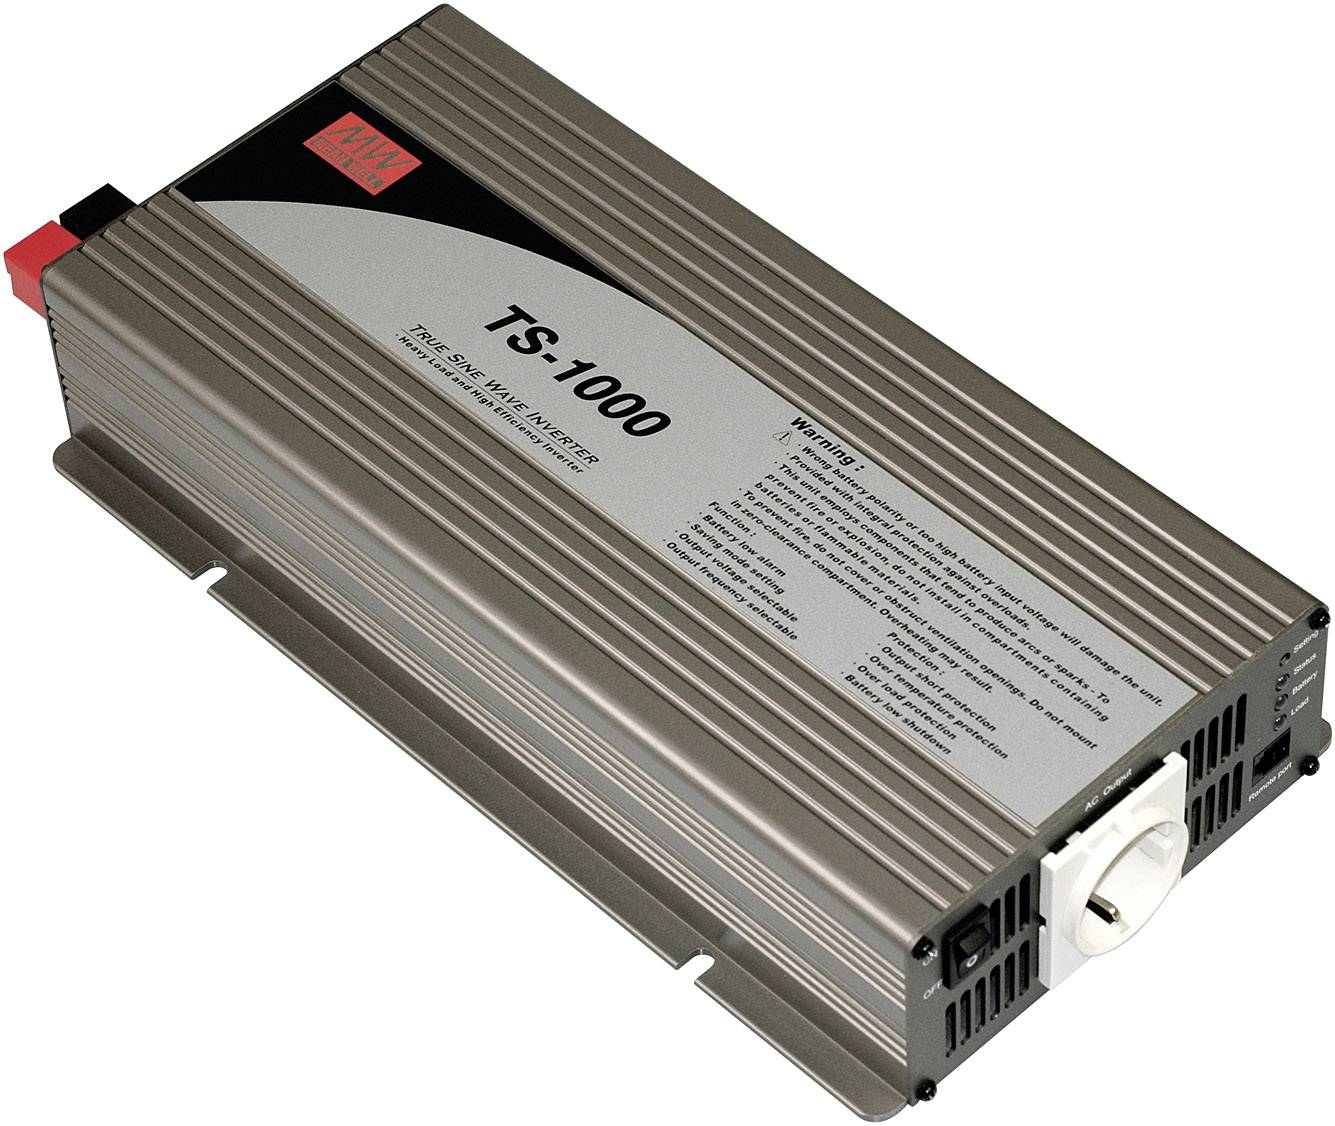 Menič napätia DC / AC Mean Well TS-1000-224B, 1000 W/1000 W